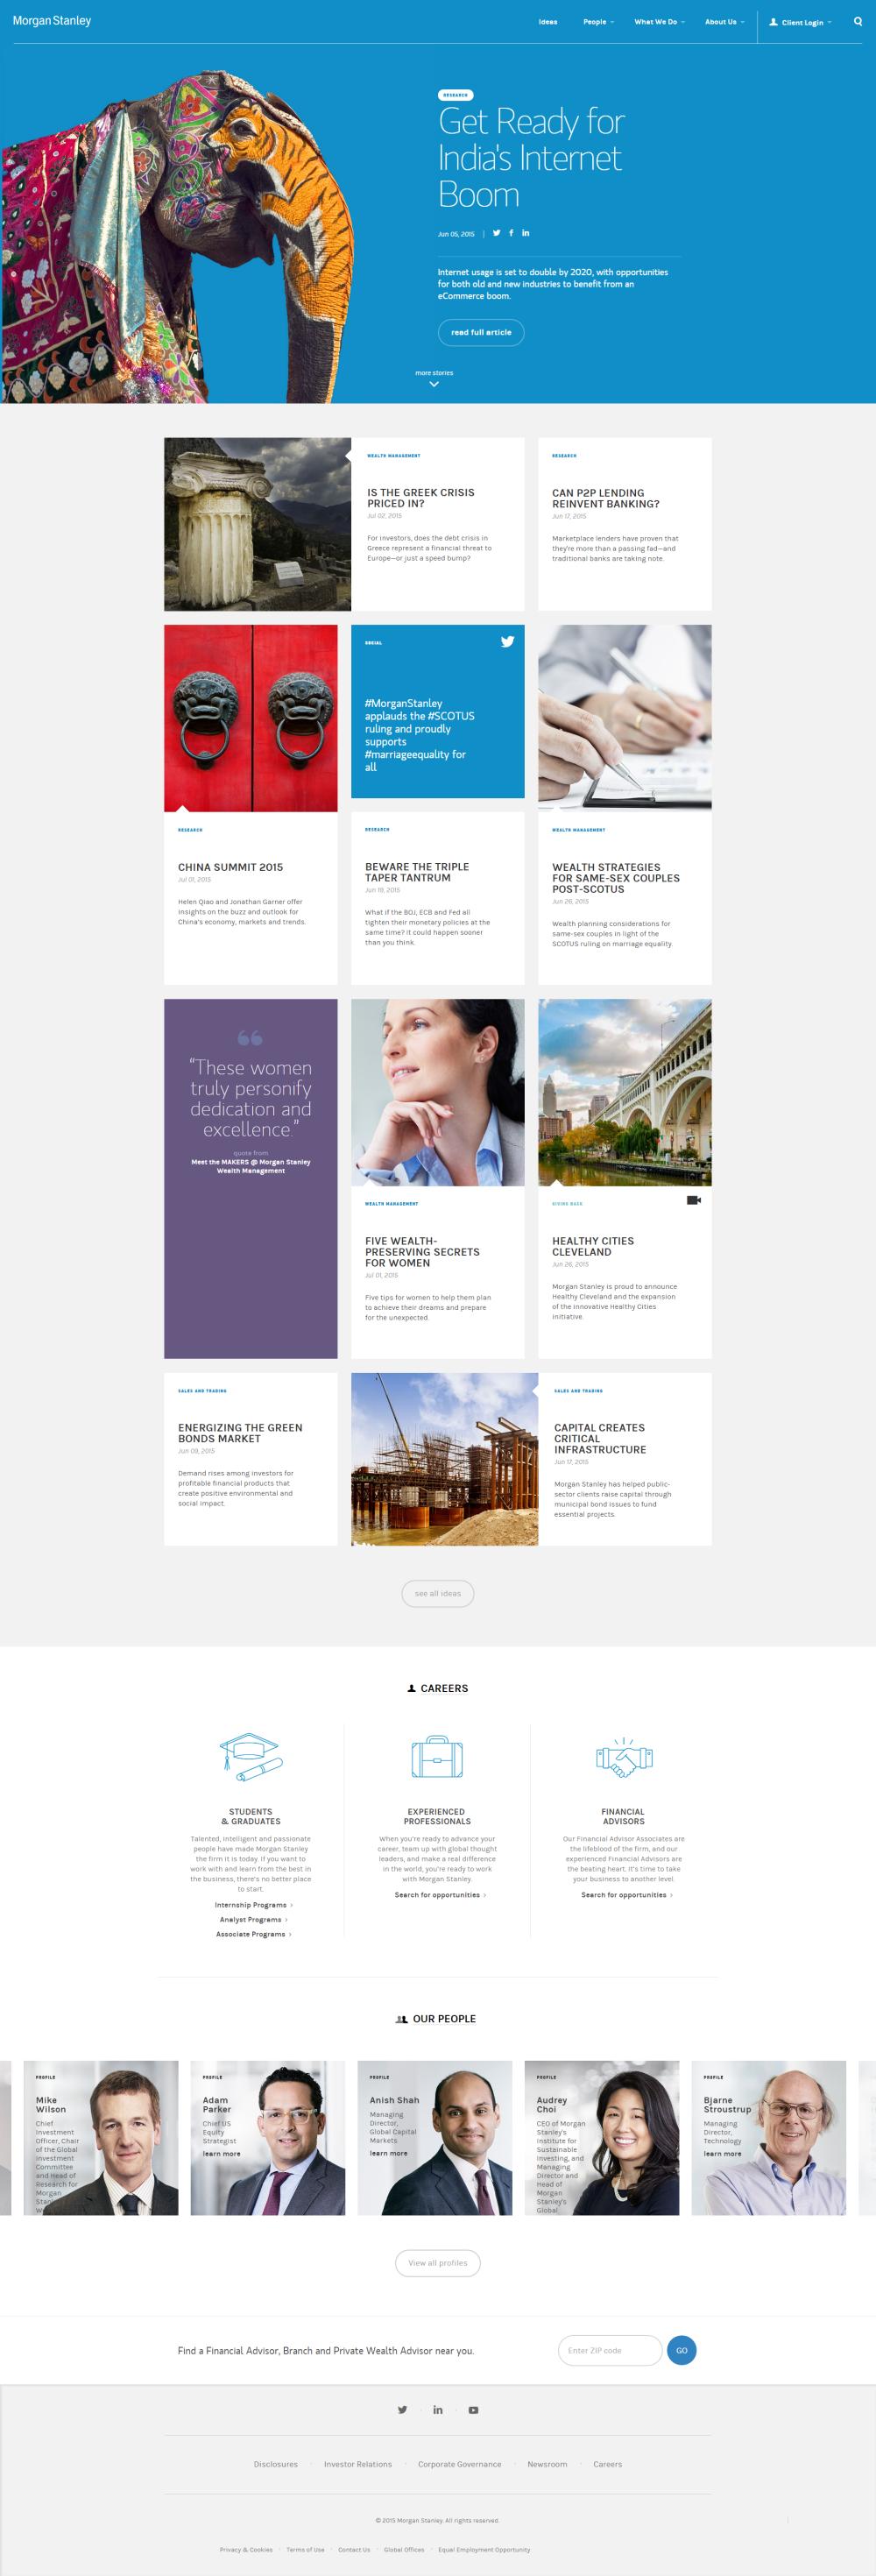 Morgan Stanley Site Design Inspiration Web Design